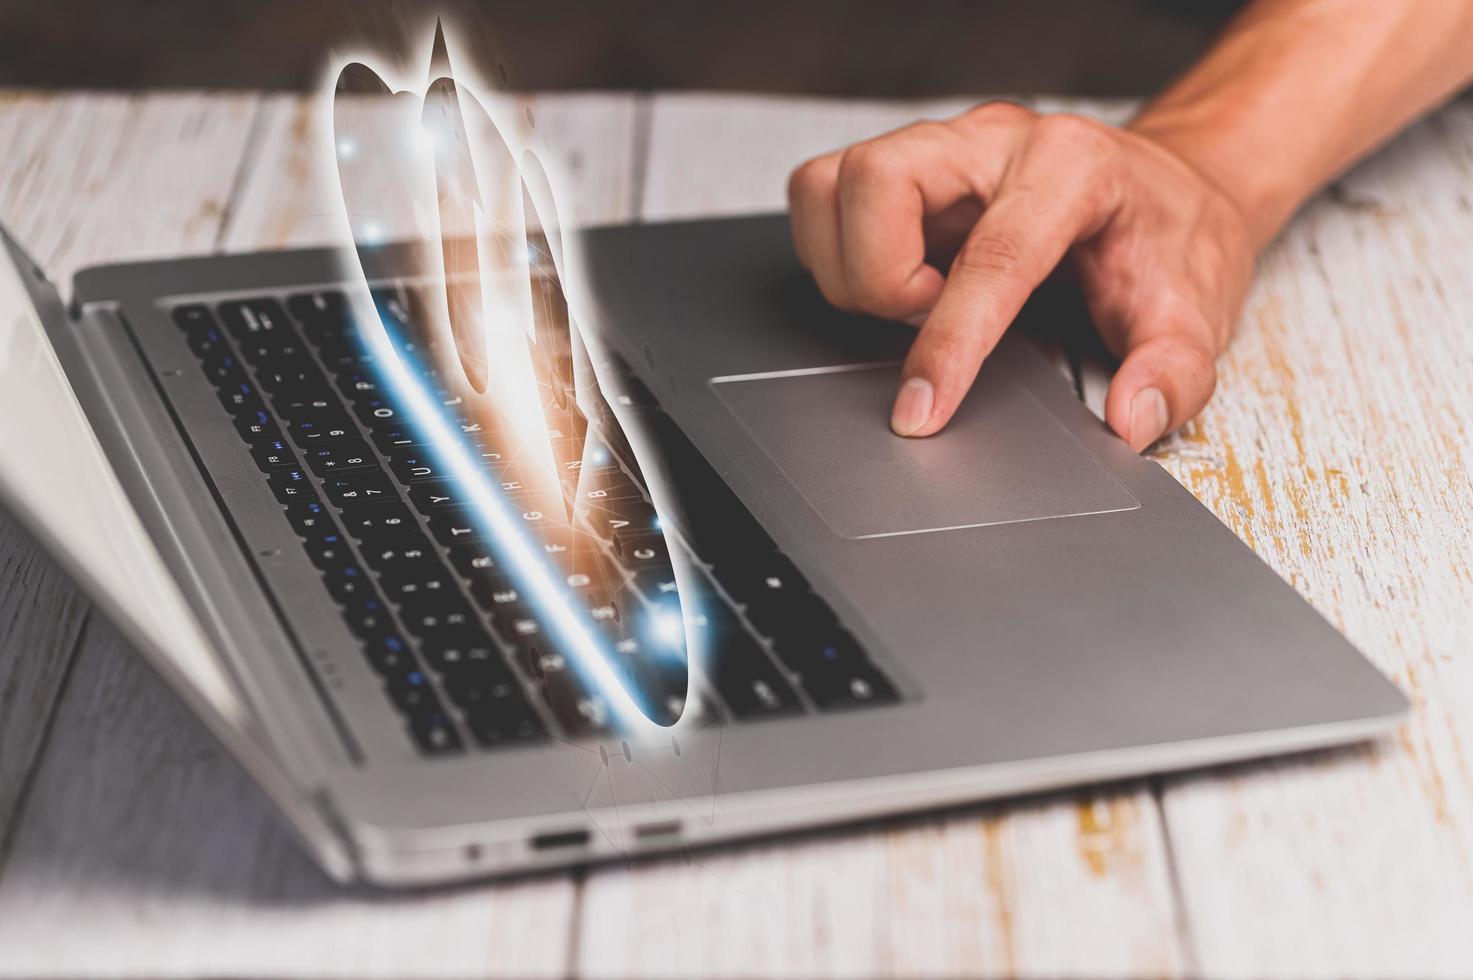 Show online storage symbols Use computer photo